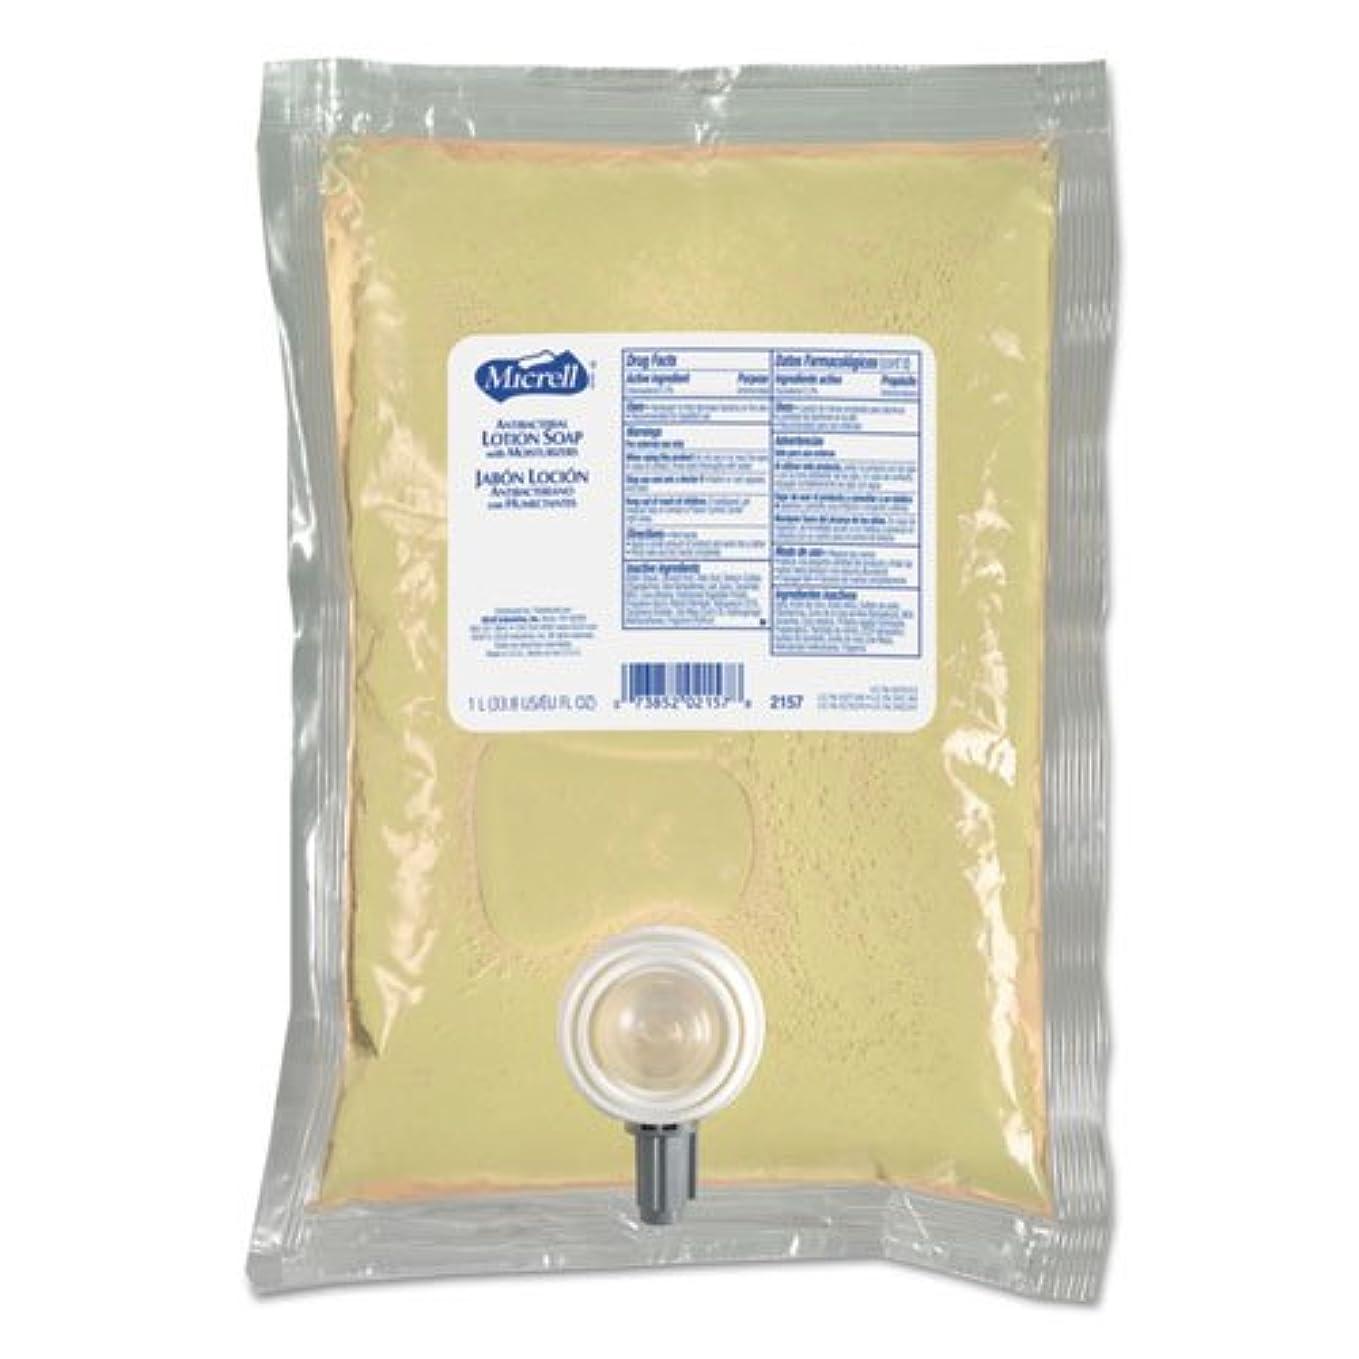 goj215708ea – MICRELL NXT抗菌ローションソープ詰め替え